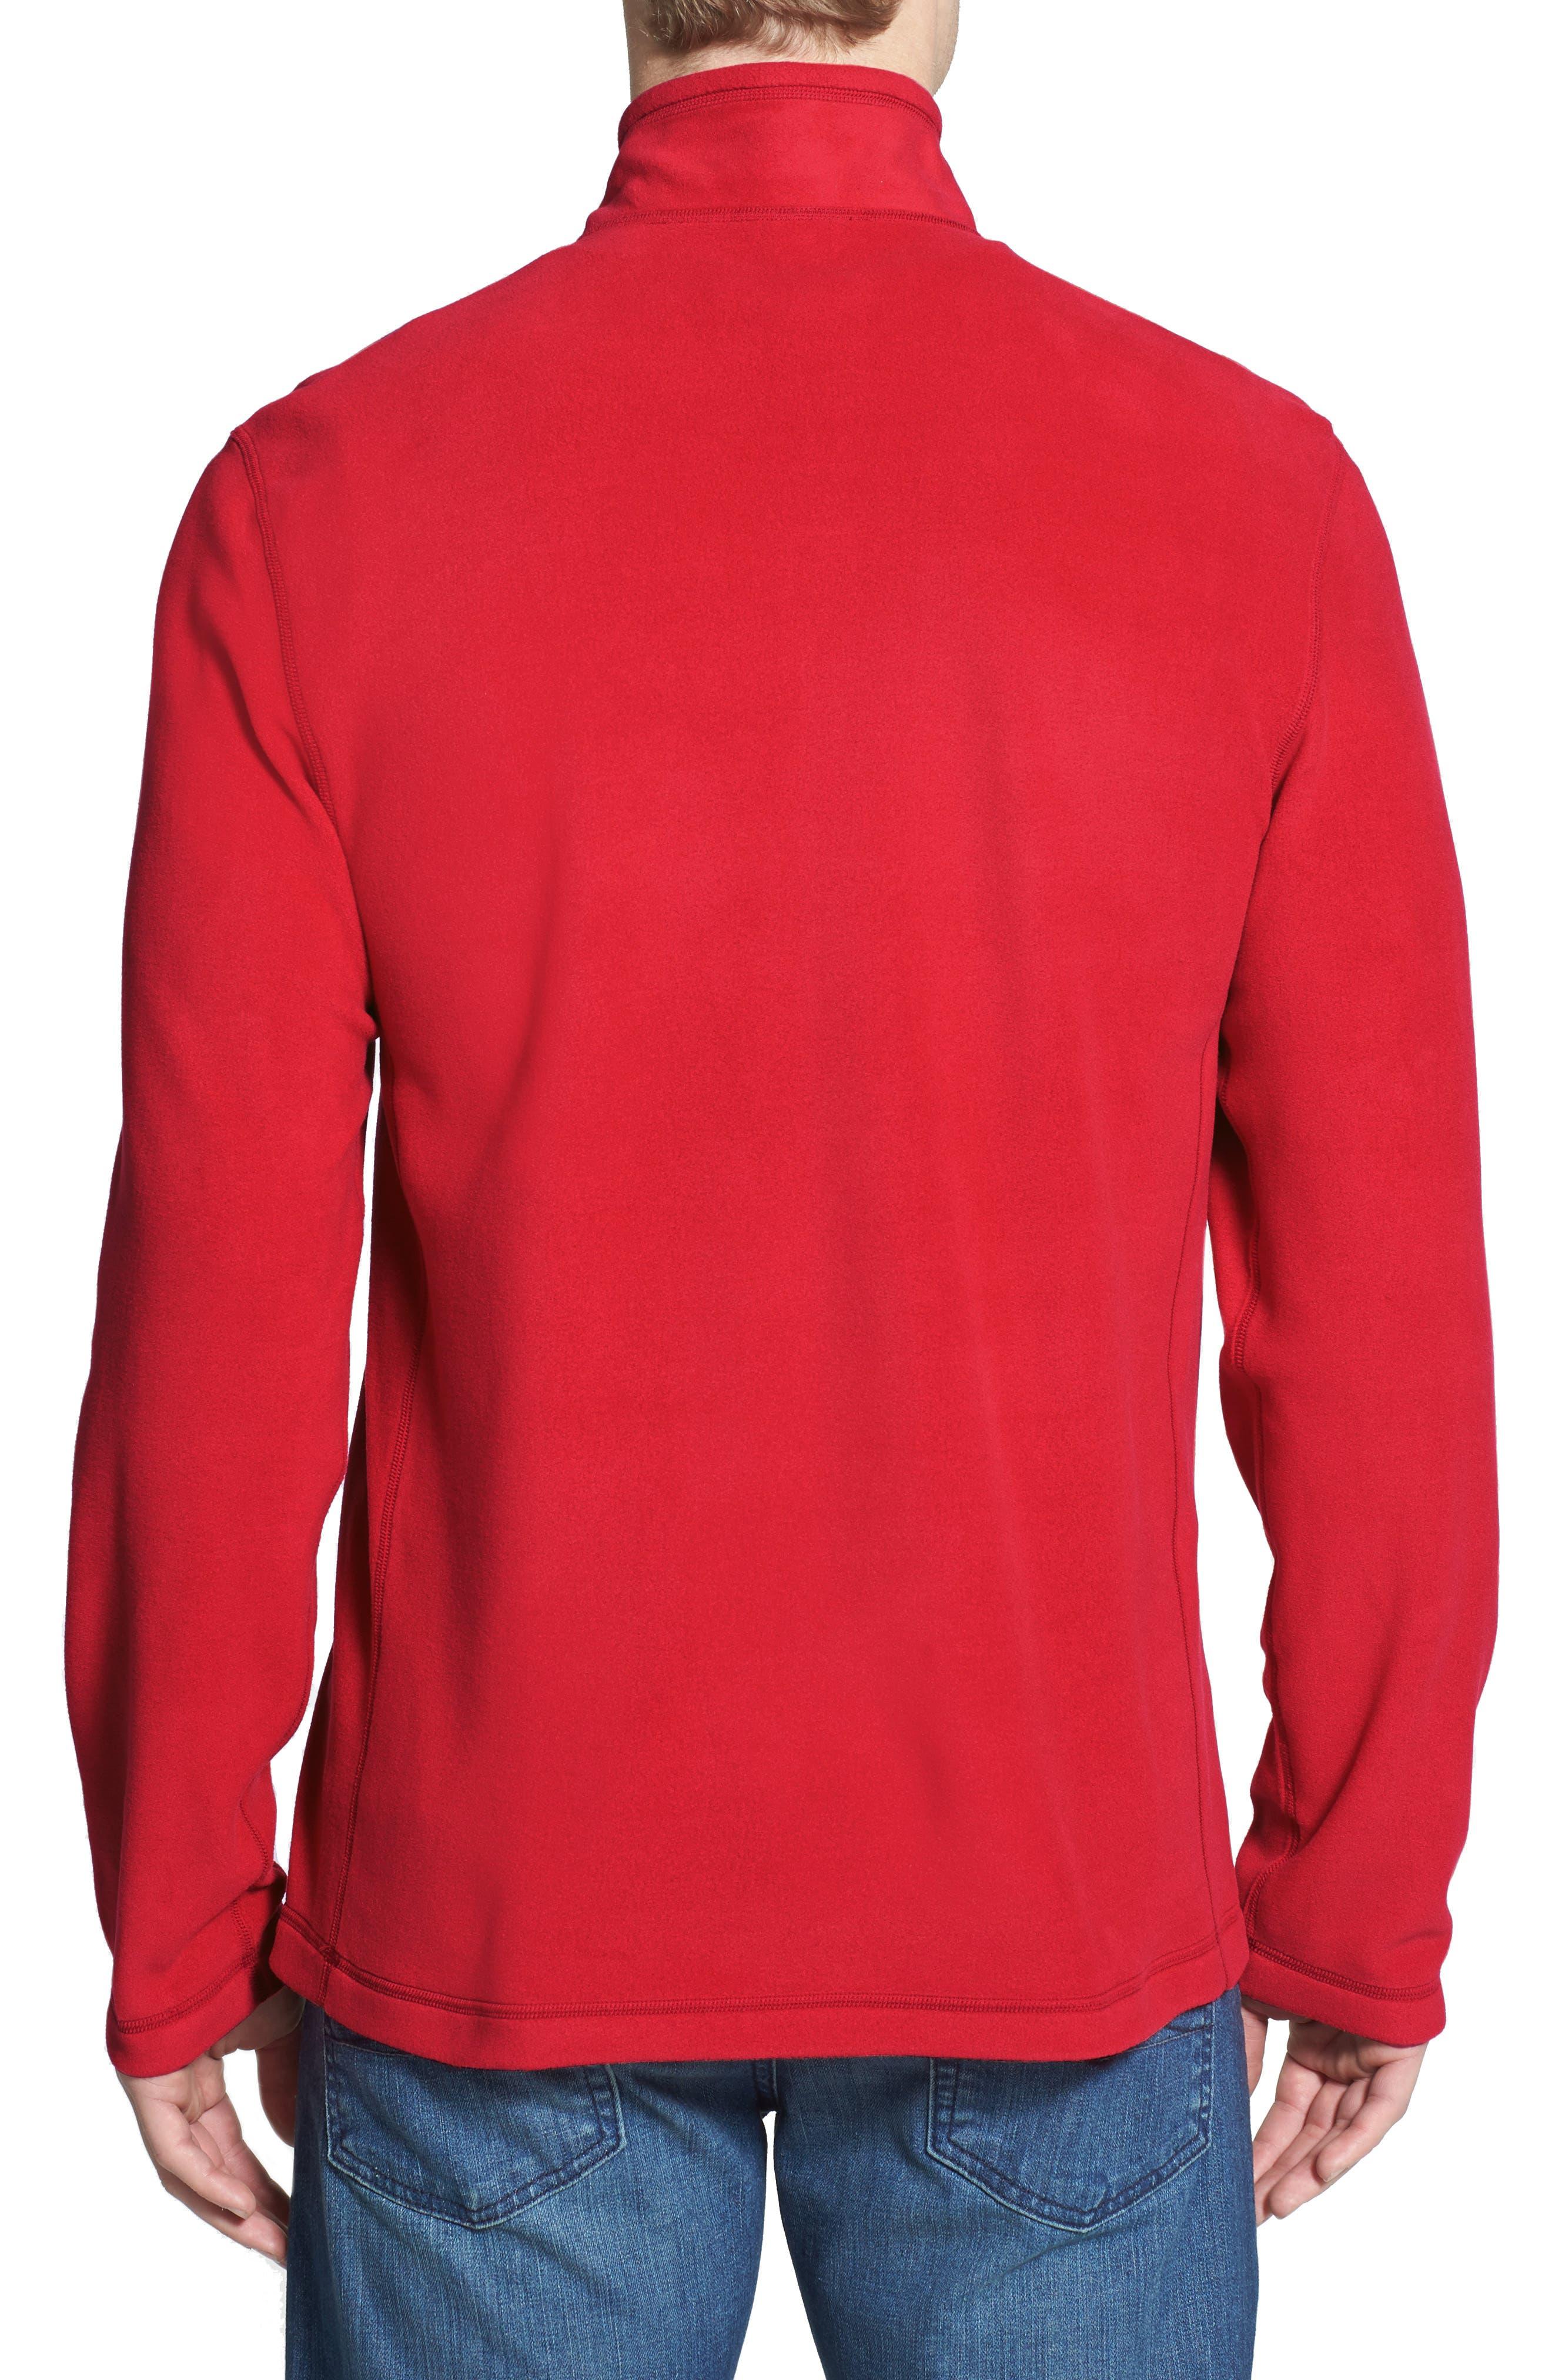 'TKA 100 Glacier' Quarter Zip Fleece Pullover,                             Alternate thumbnail 58, color,